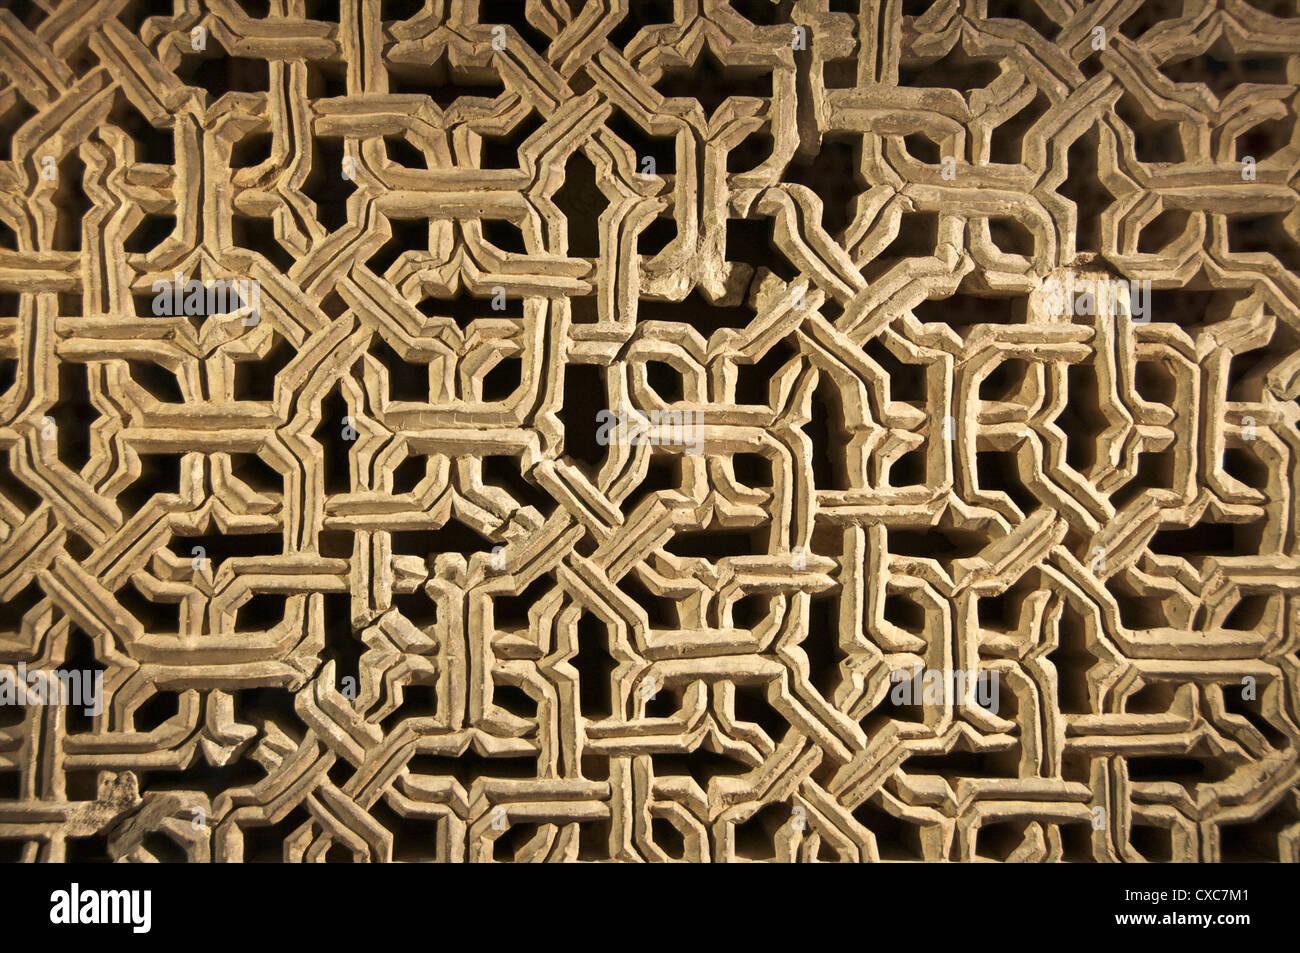 Typical plaster geometric decor, the Aljaferia Palace, dating from the 11th century, Saragossa (Zaragoza), Aragon, - Stock Image